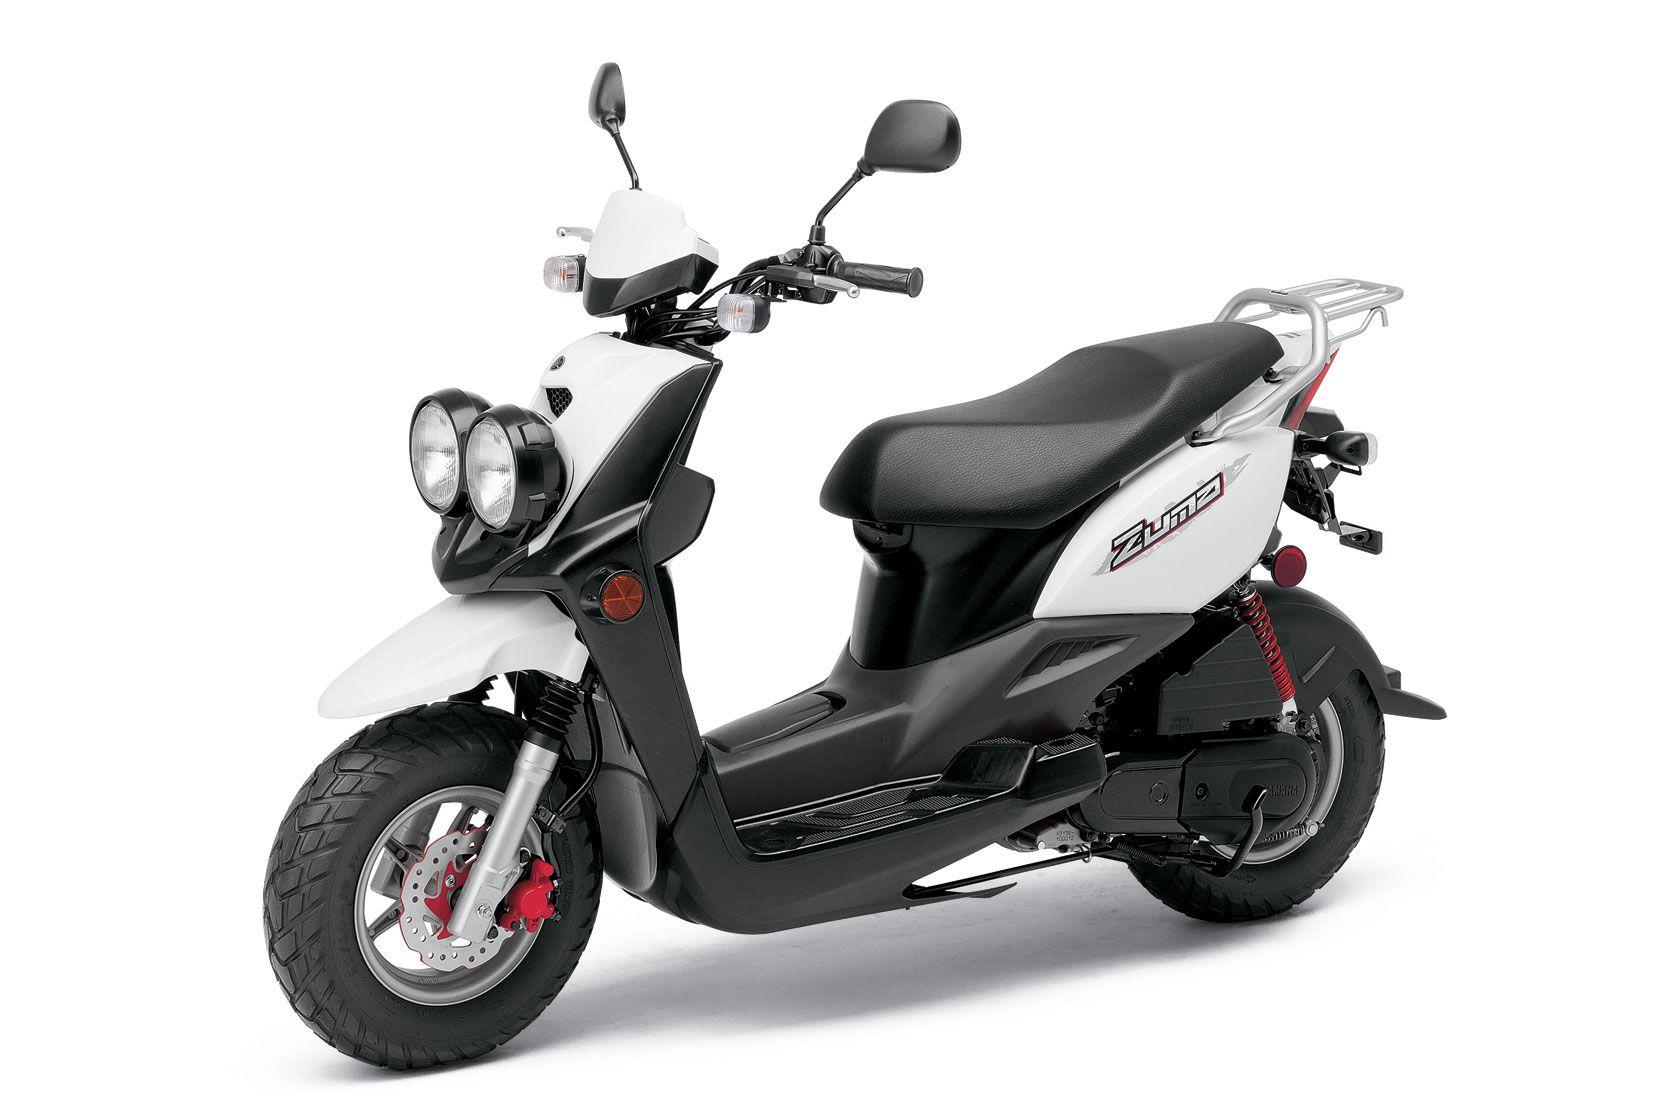 Click on image to download 2004 Yamaha ZUMA Motorcycle Service Manual